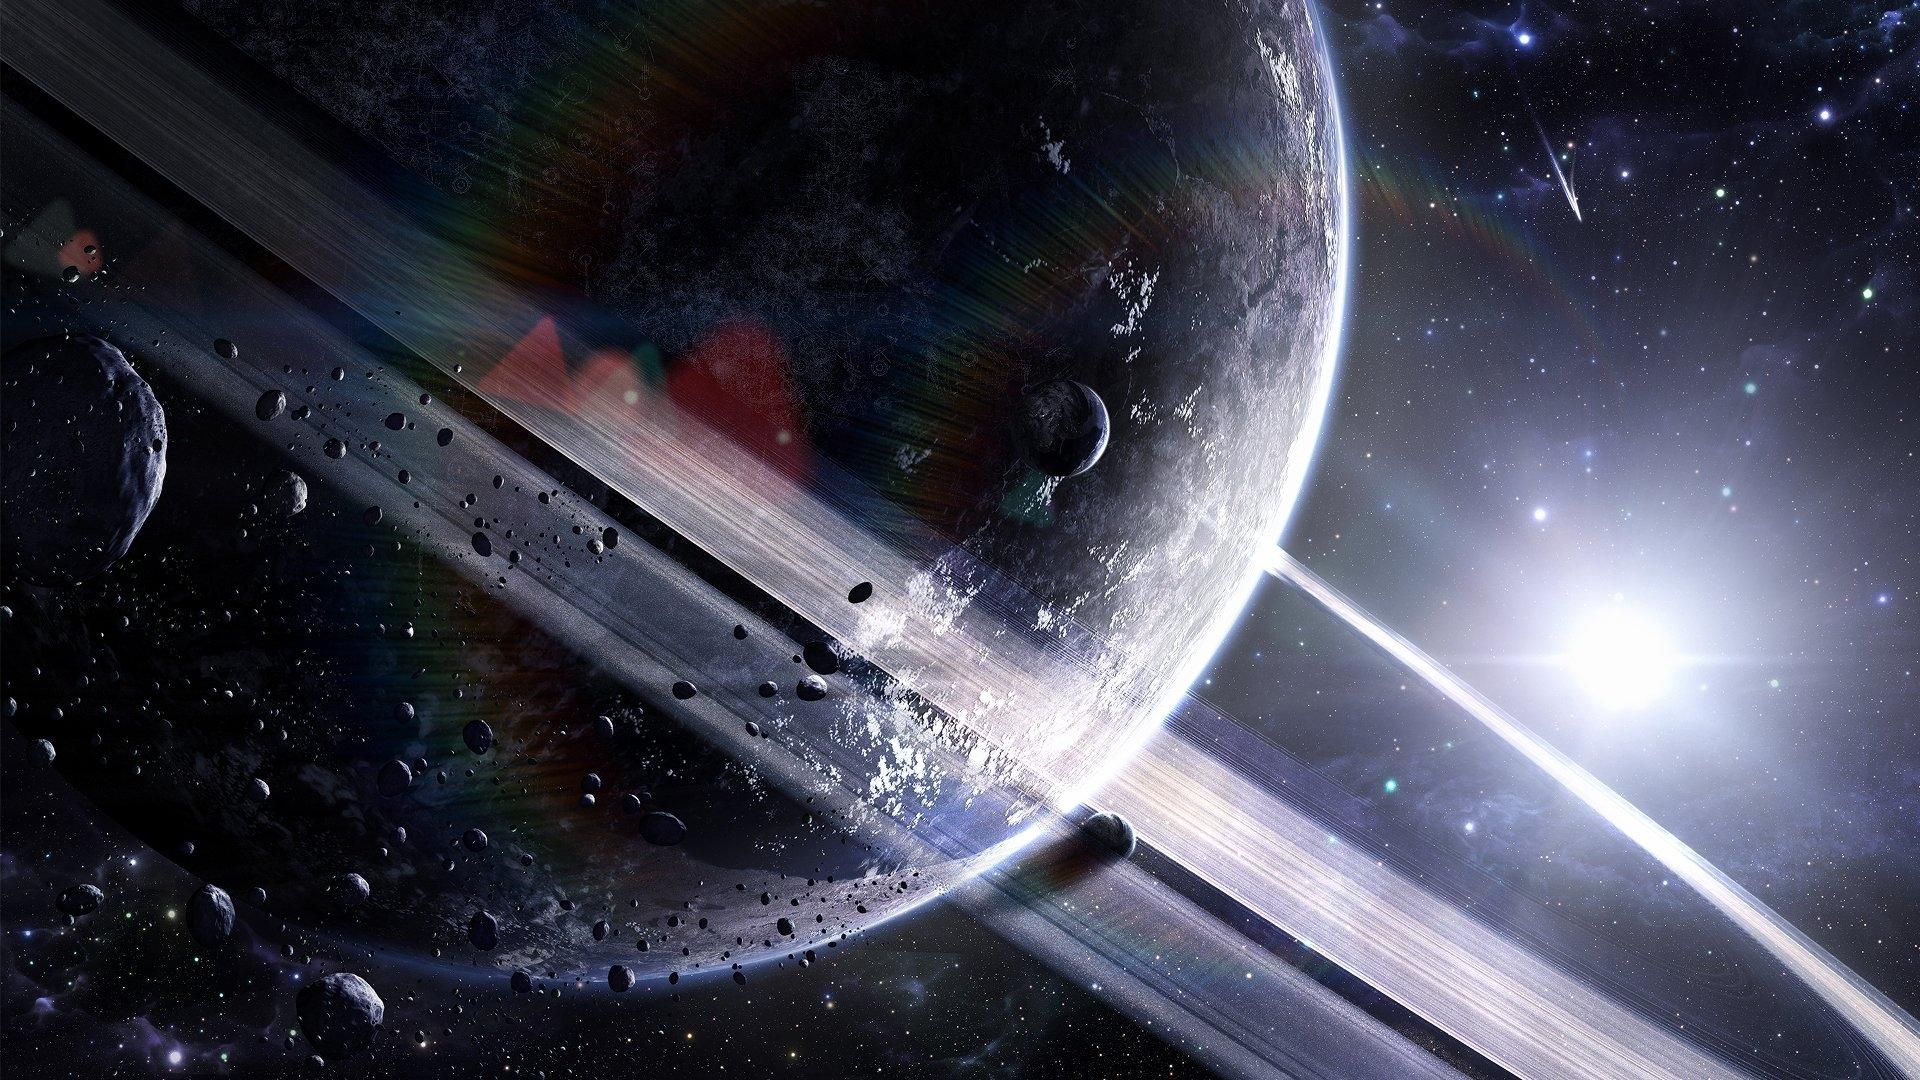 hd 1080p space - walldevil